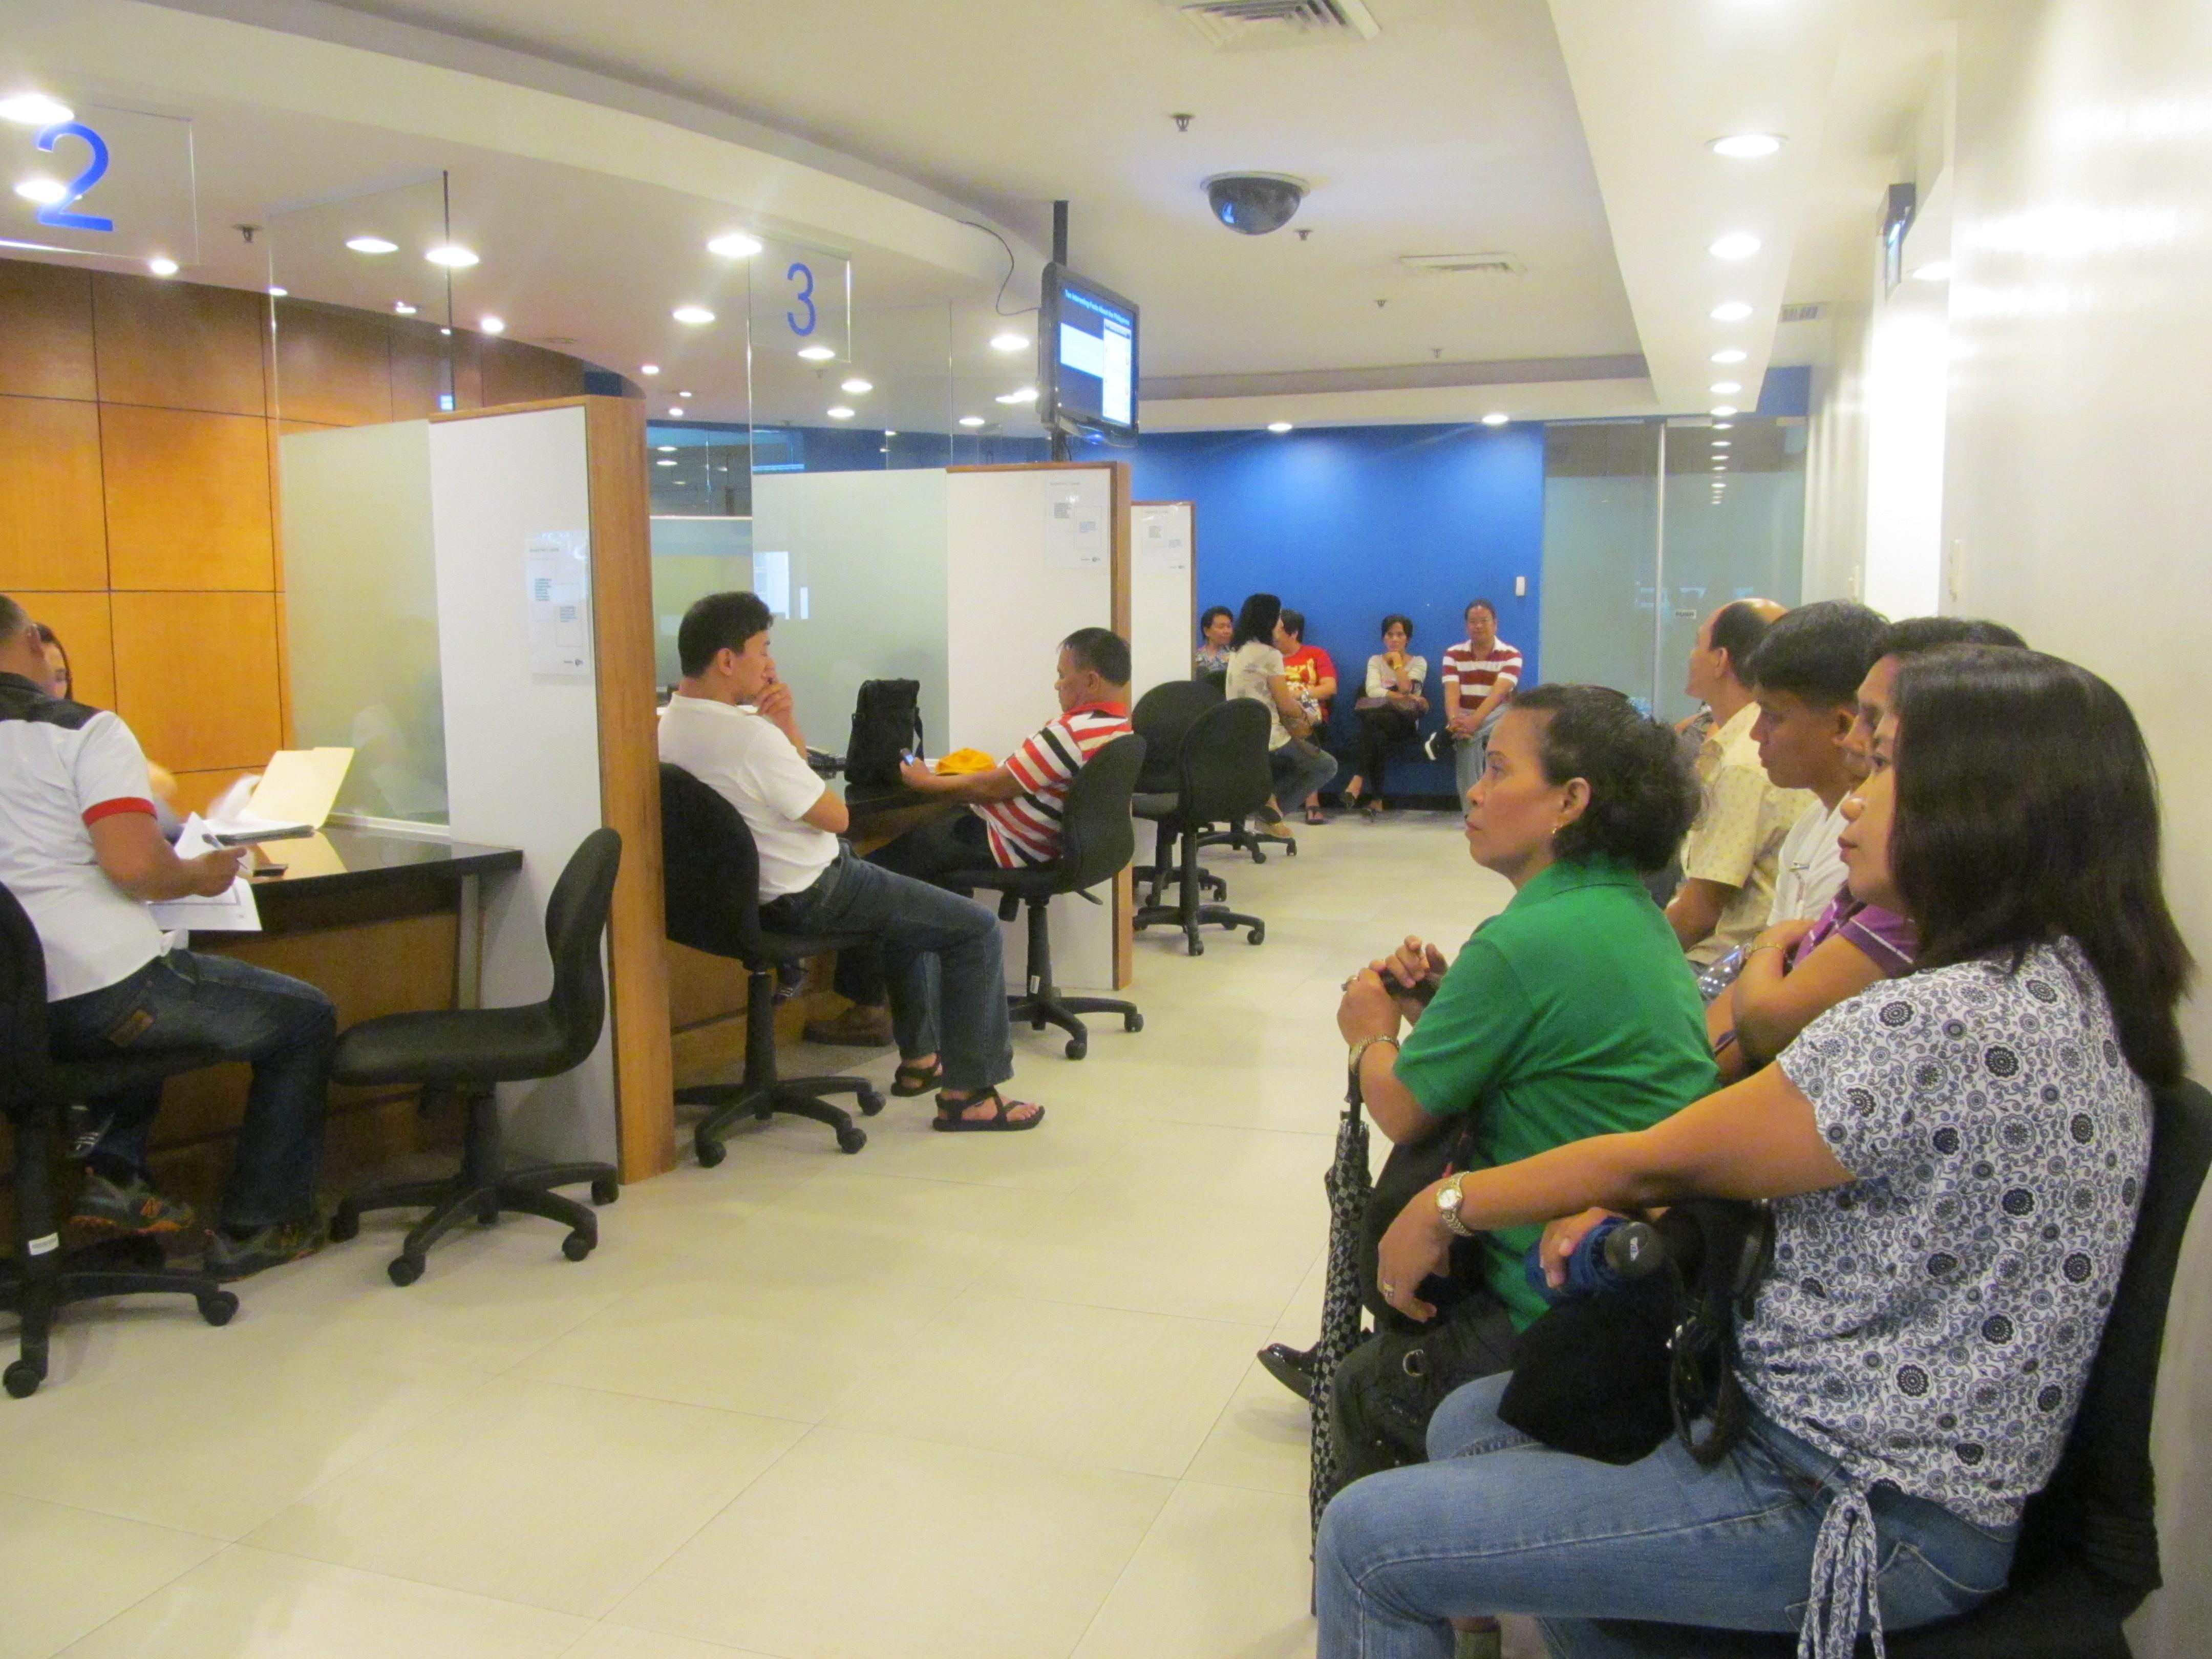 BFS provides homes for 100K Filipinos